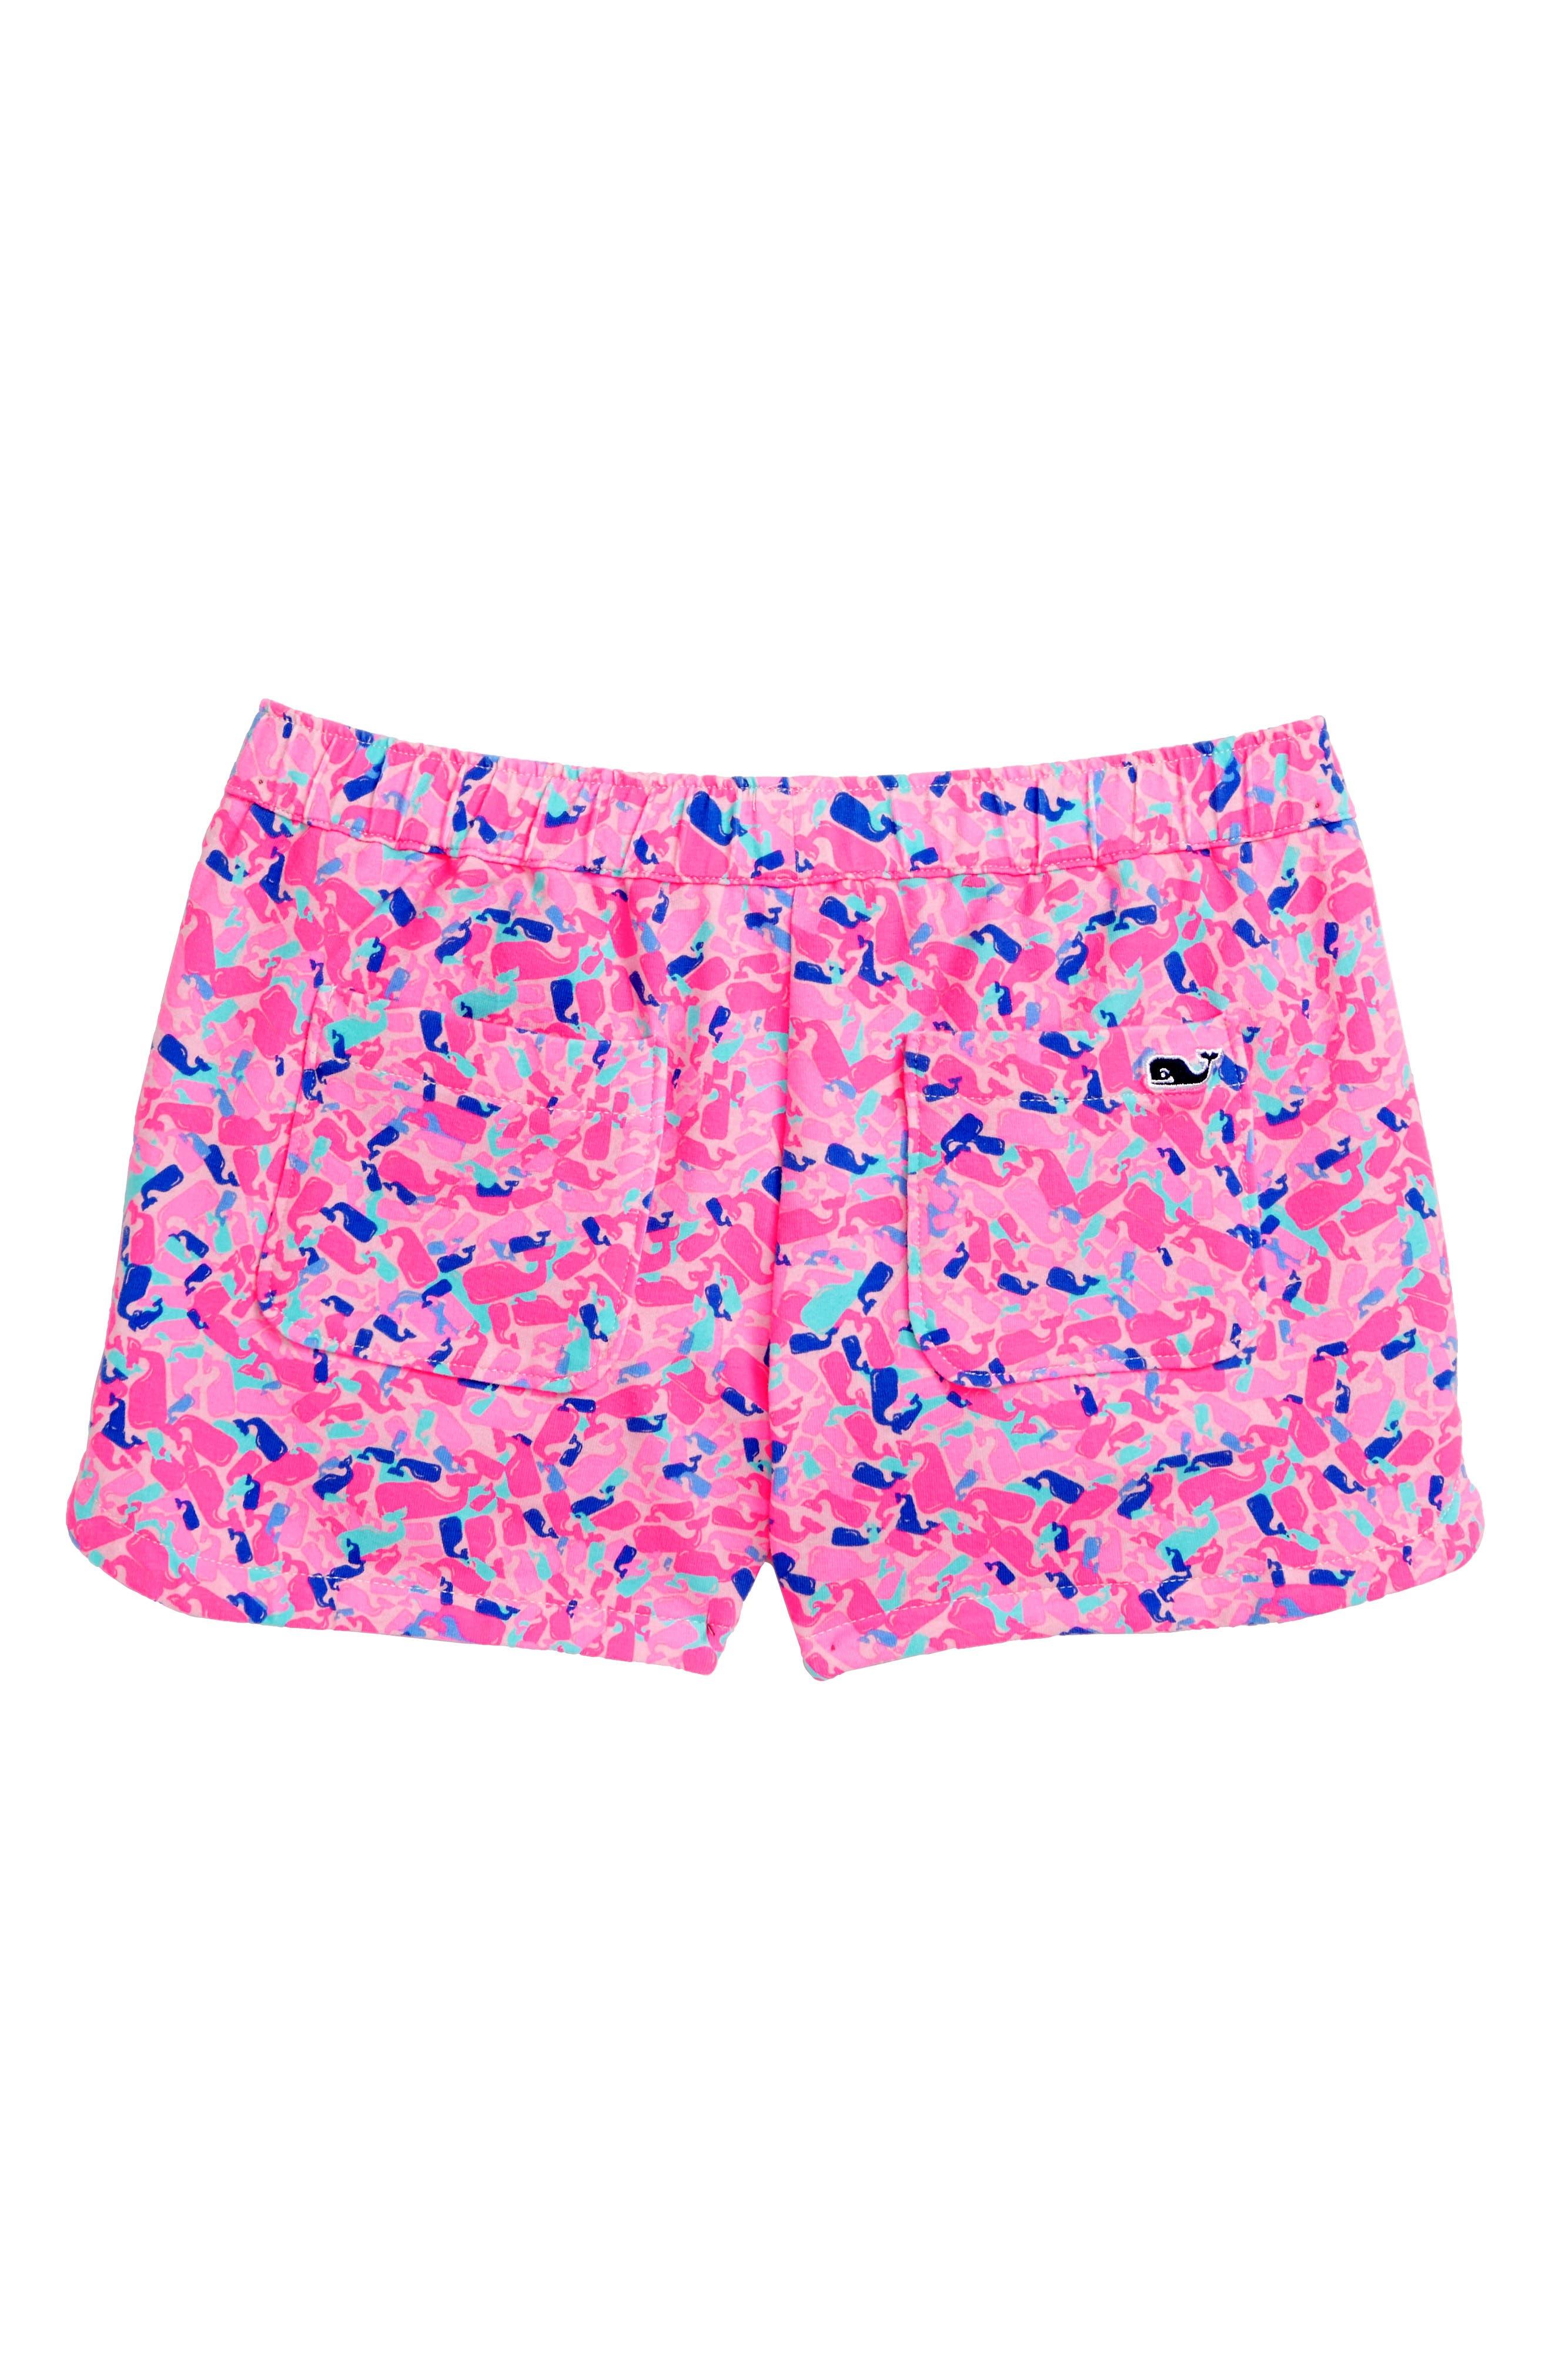 Whale Swirl Shorts,                             Alternate thumbnail 2, color,                             650